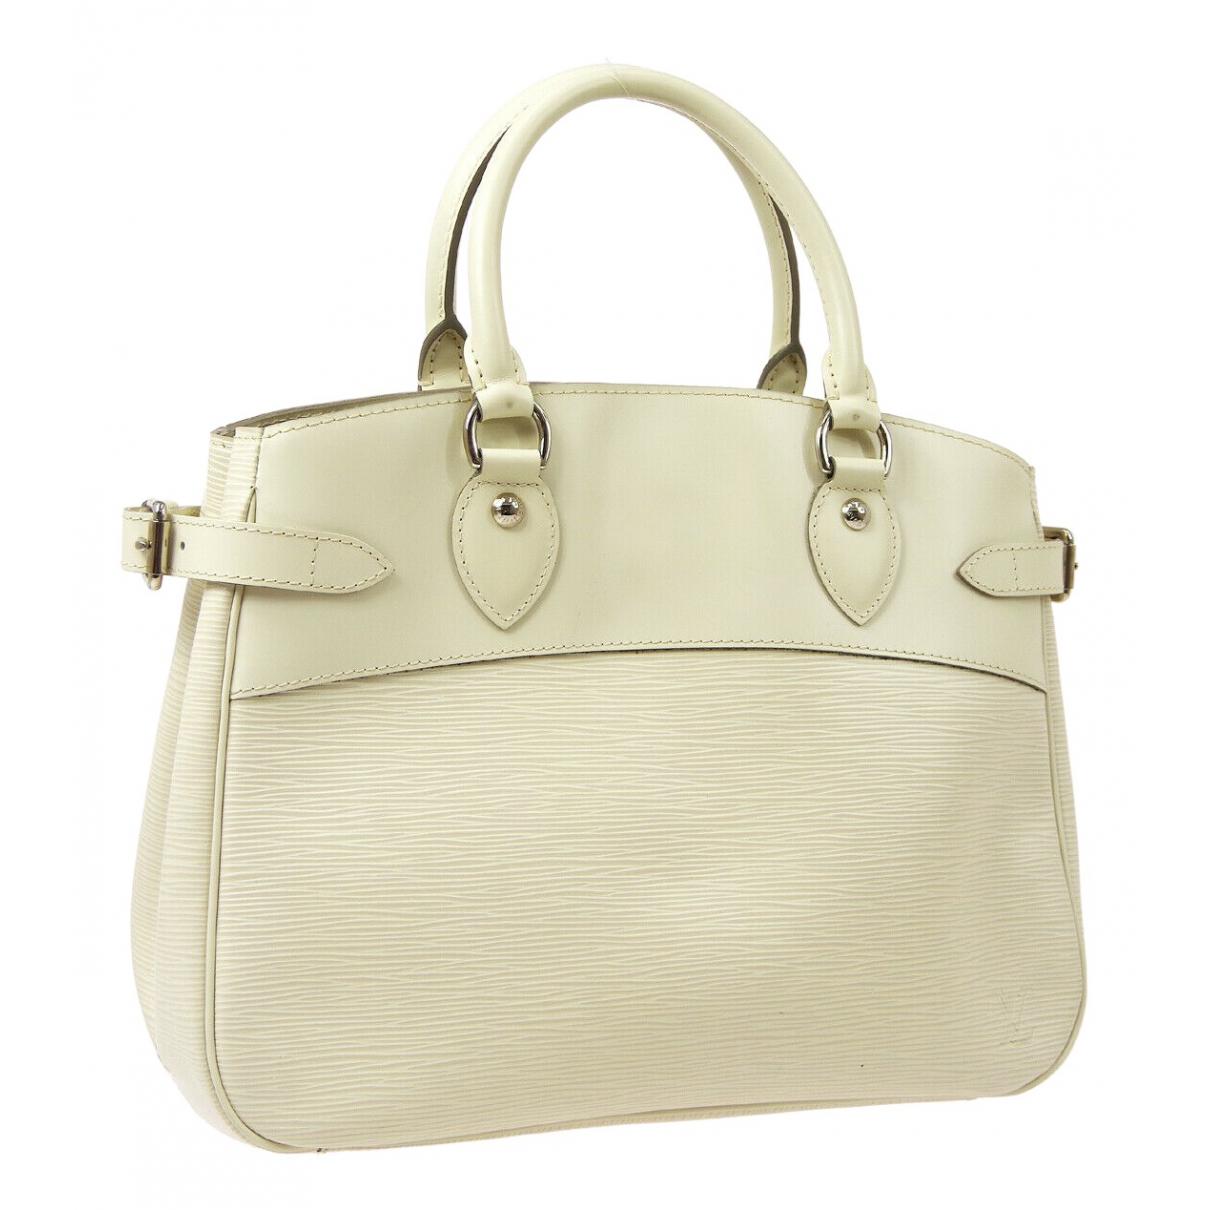 Louis Vuitton Passy Beige Leather handbag for Women \N